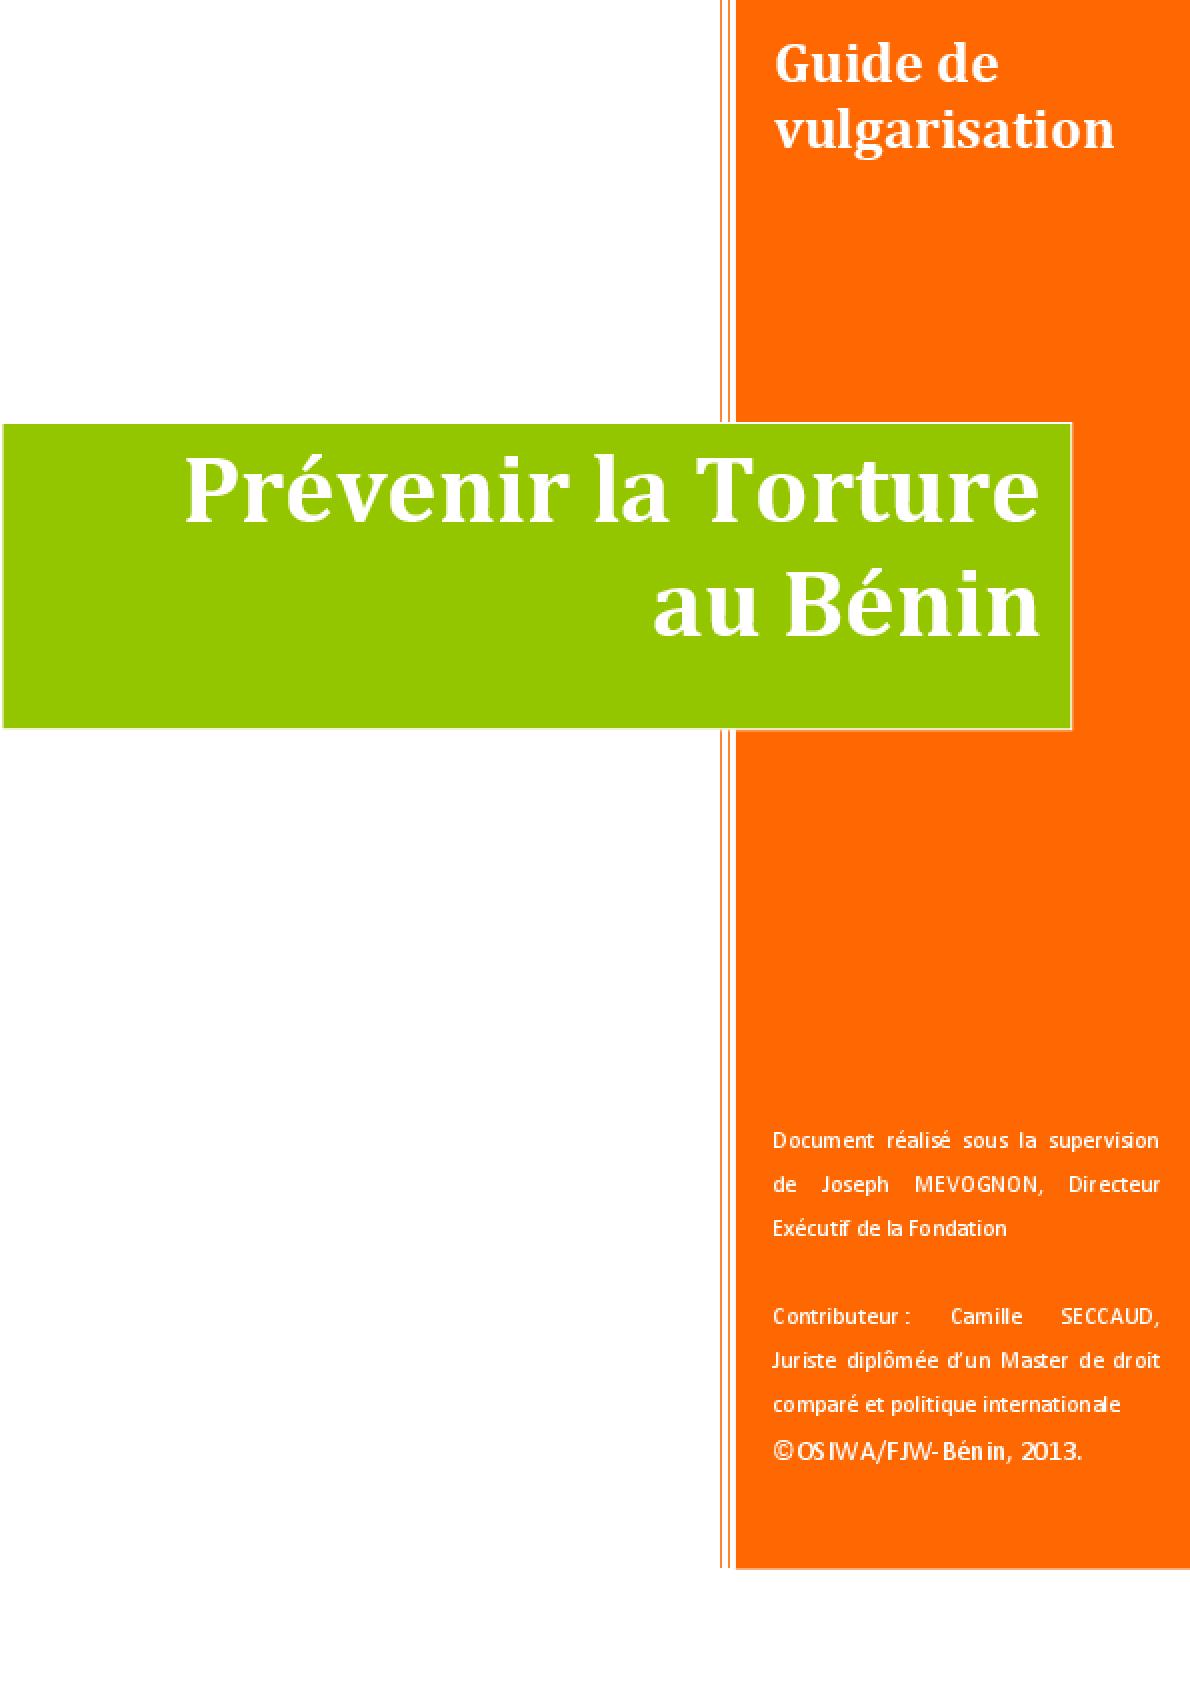 Prévenir la Torture au Benin